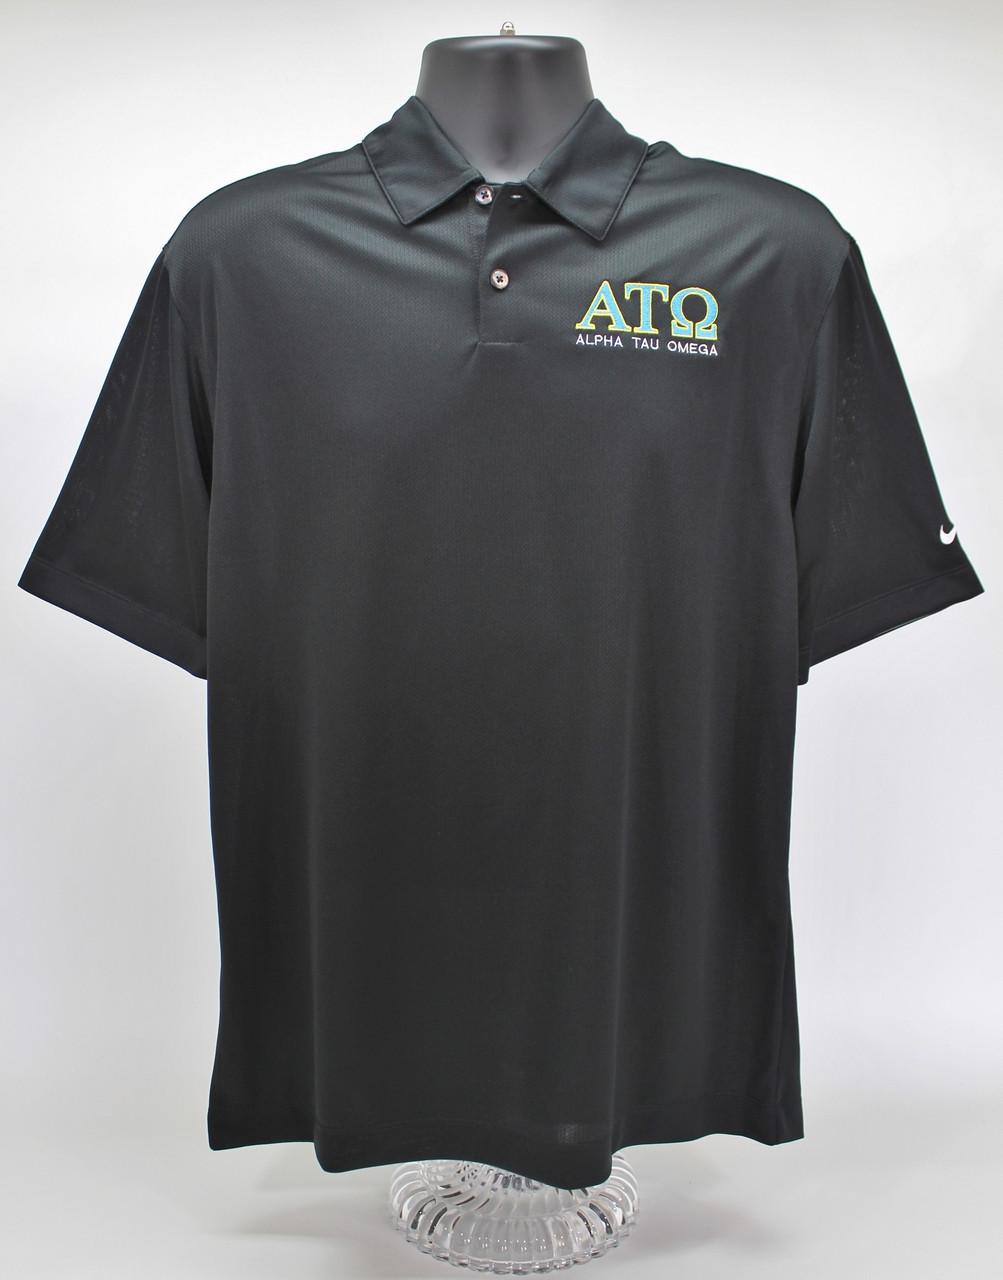 cd3a415d Alpha Tau Omega Nike Dry Fit Black Polo Golf Shirt - Bro Graphics